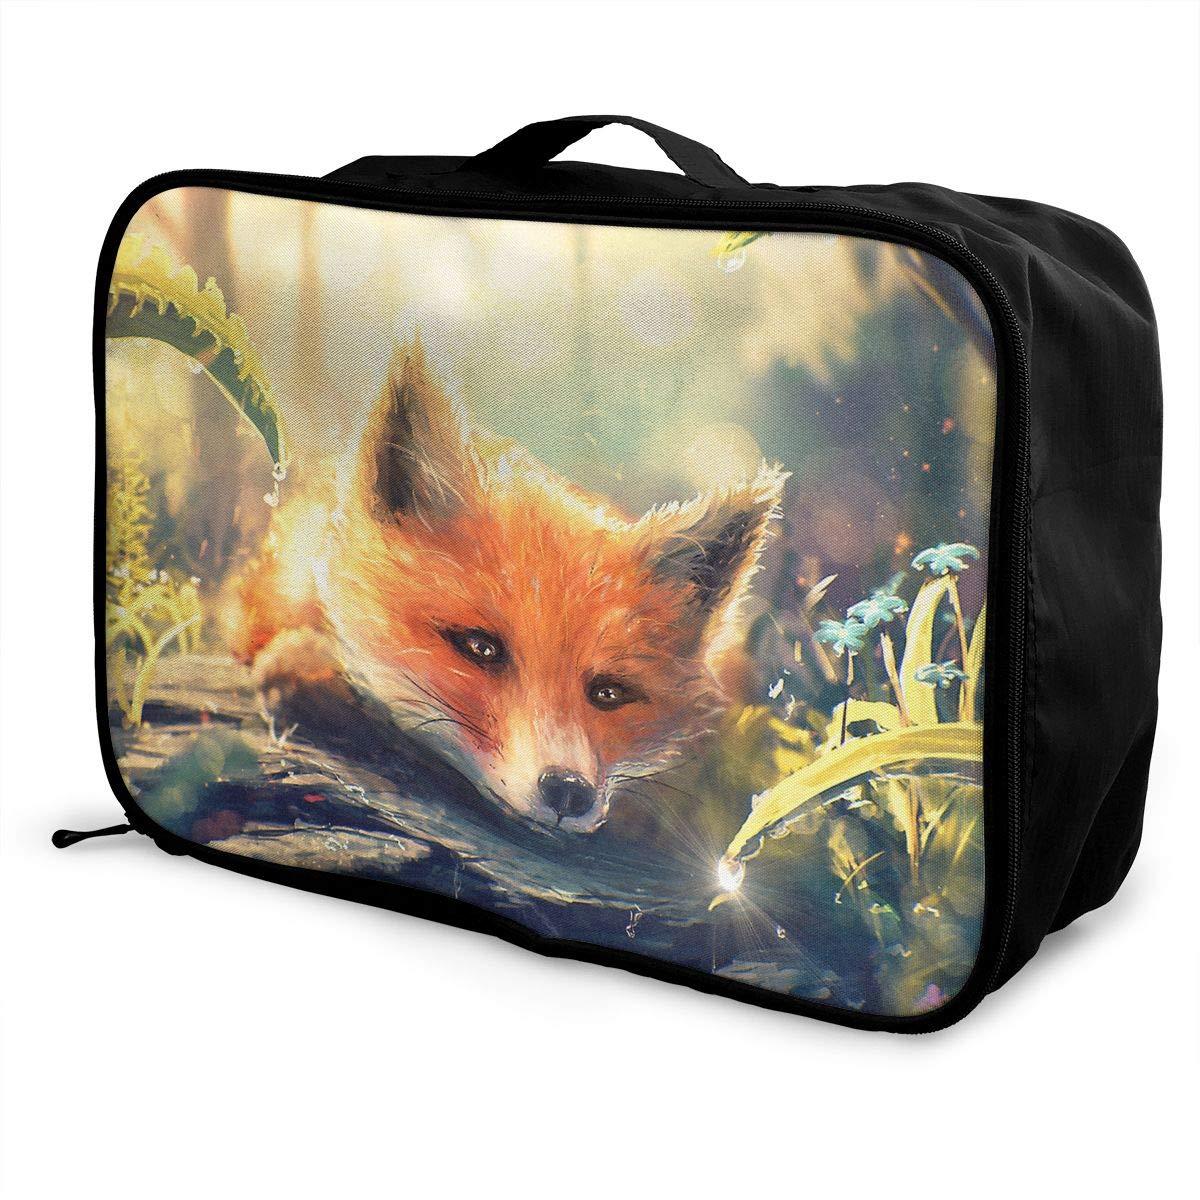 Travel Luggage Duffle Bag Lightweight Portable Handbag Animals Fox Print Large Capacity Waterproof Foldable Storage Tote